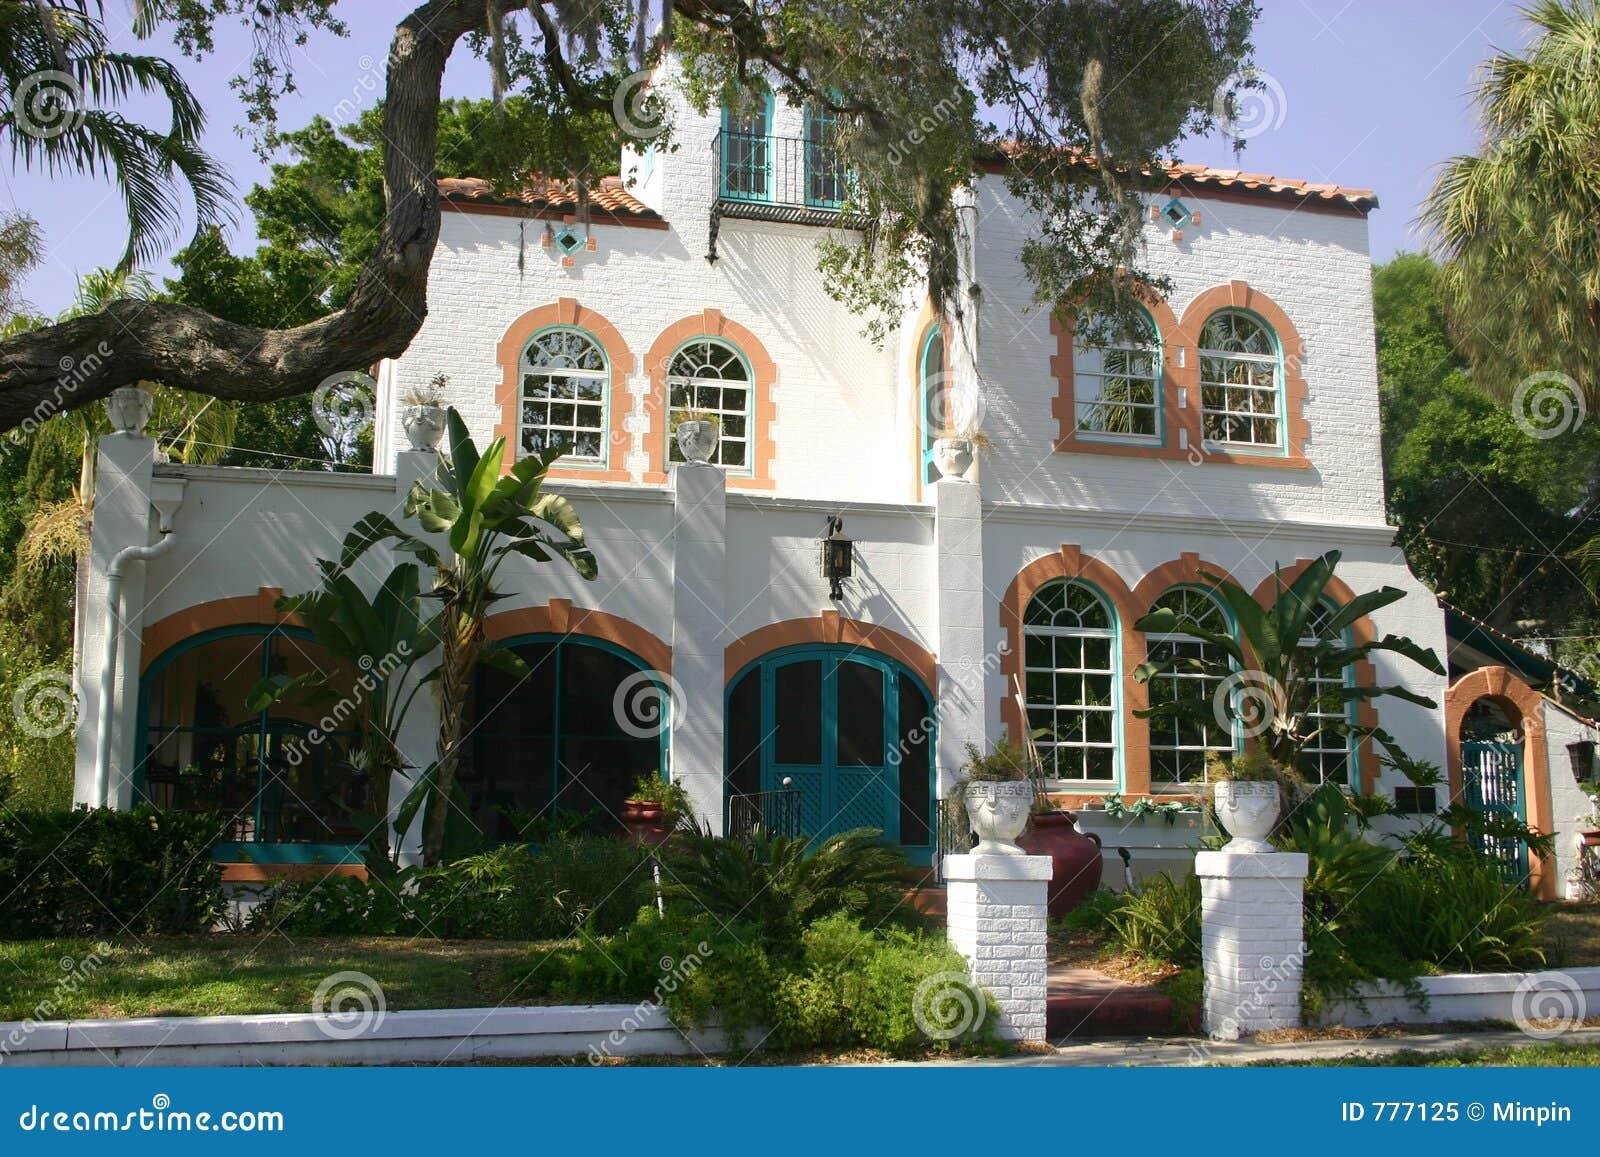 Mediterranean House Royalty Free Stock Photo - Image: 777125